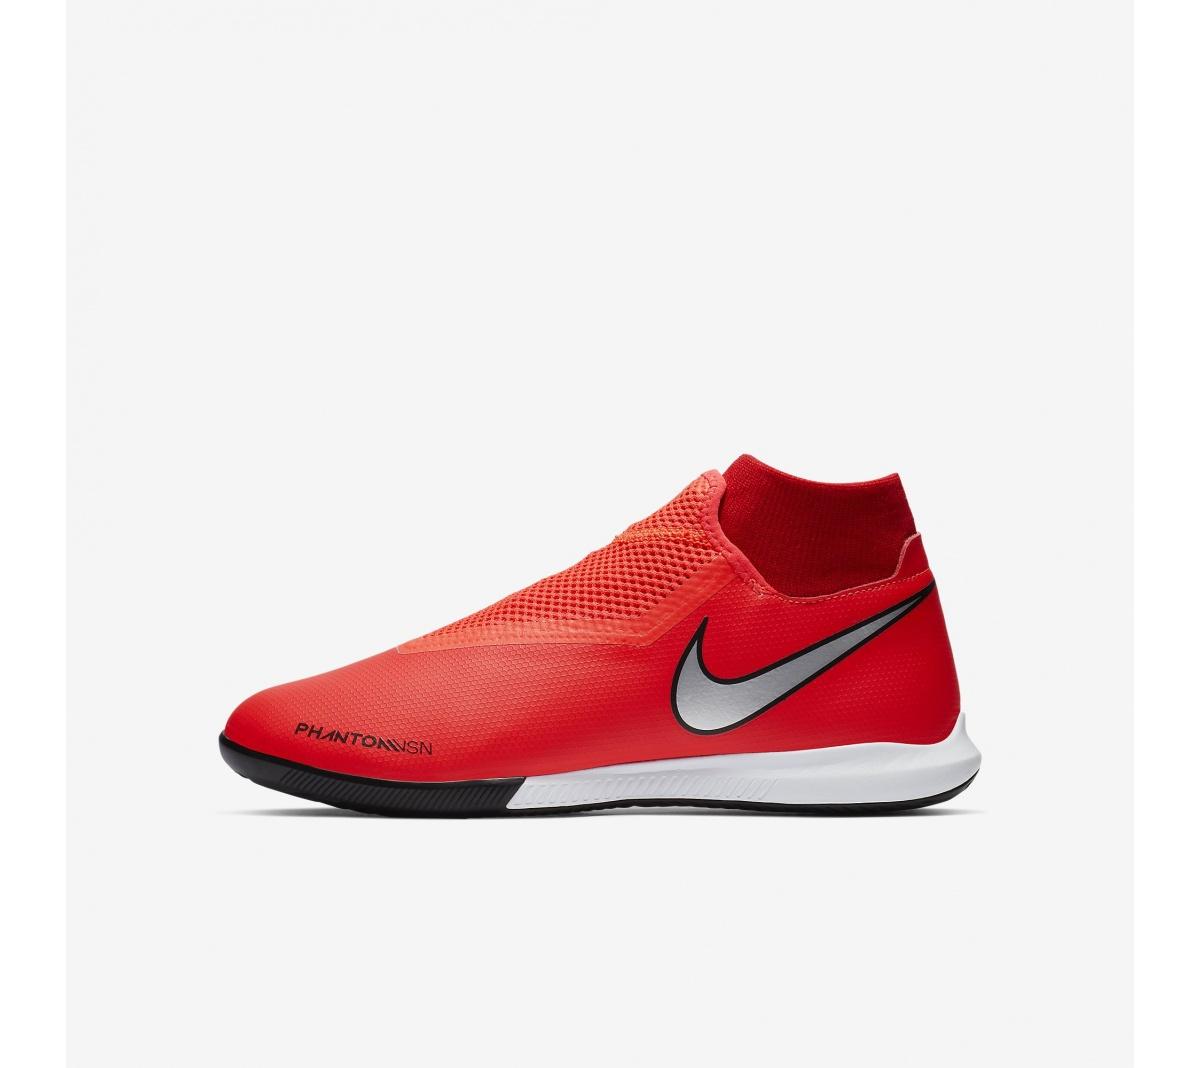 Tênis Nike Phantom Vision Academy DF Futsal Adulto - Mundo do Futebol 9e9911fad6ea3